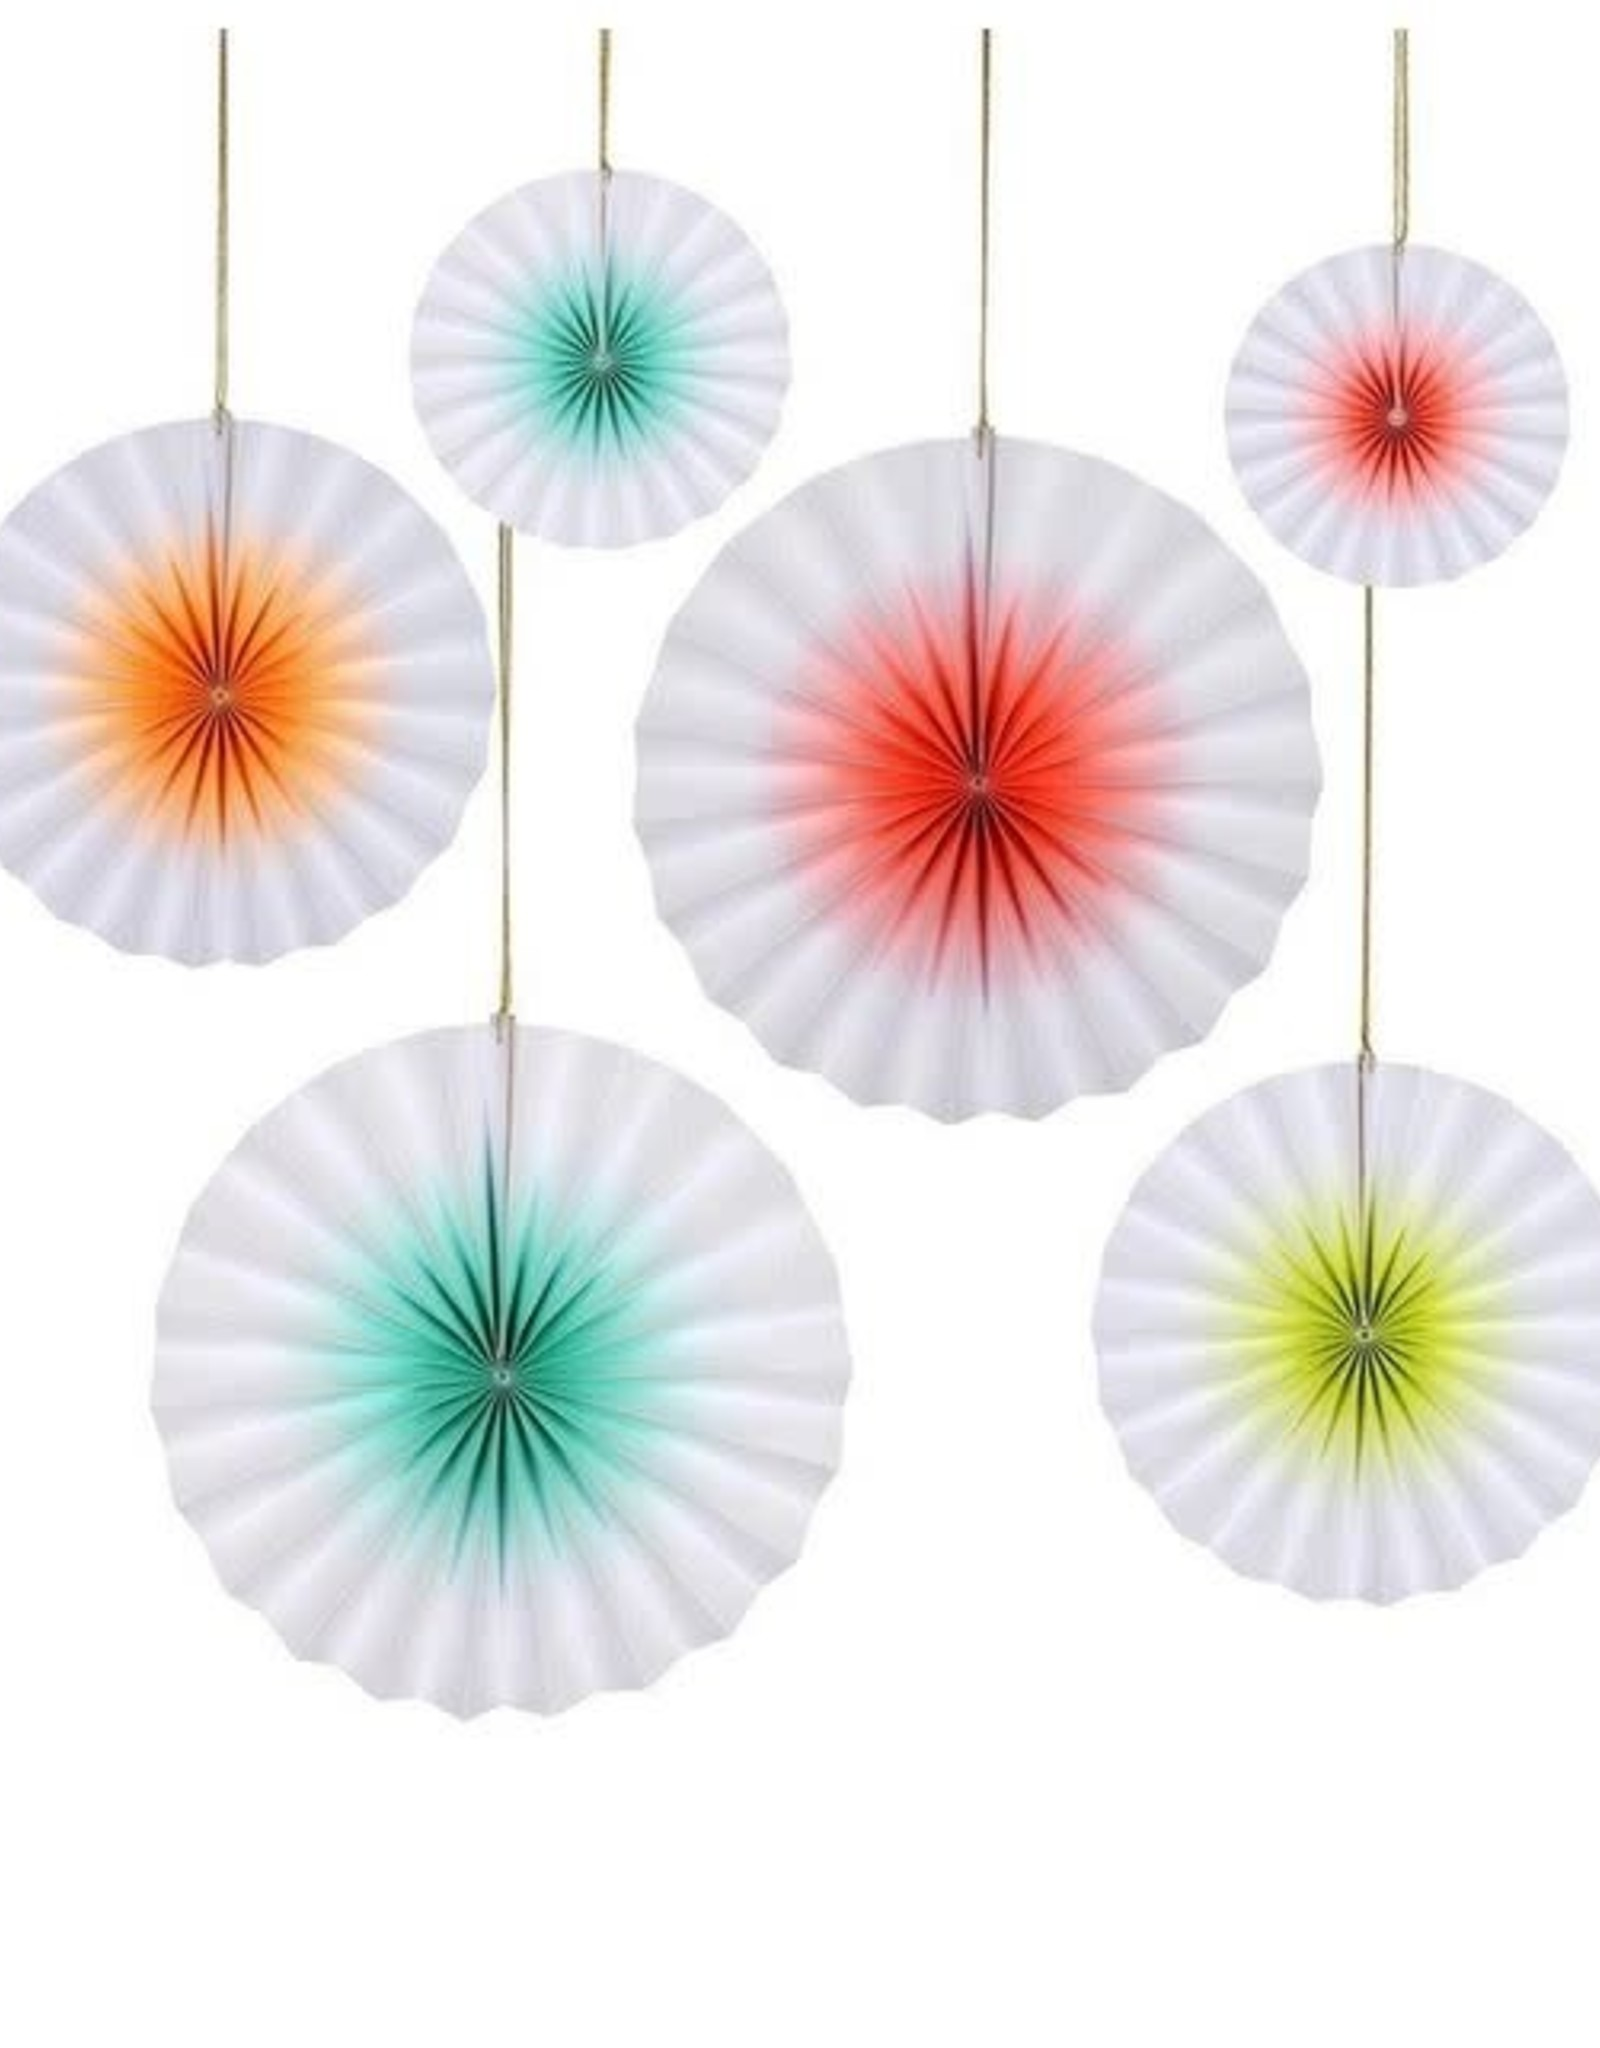 Meri Meri Neon Ombre Pinwheel Decorations